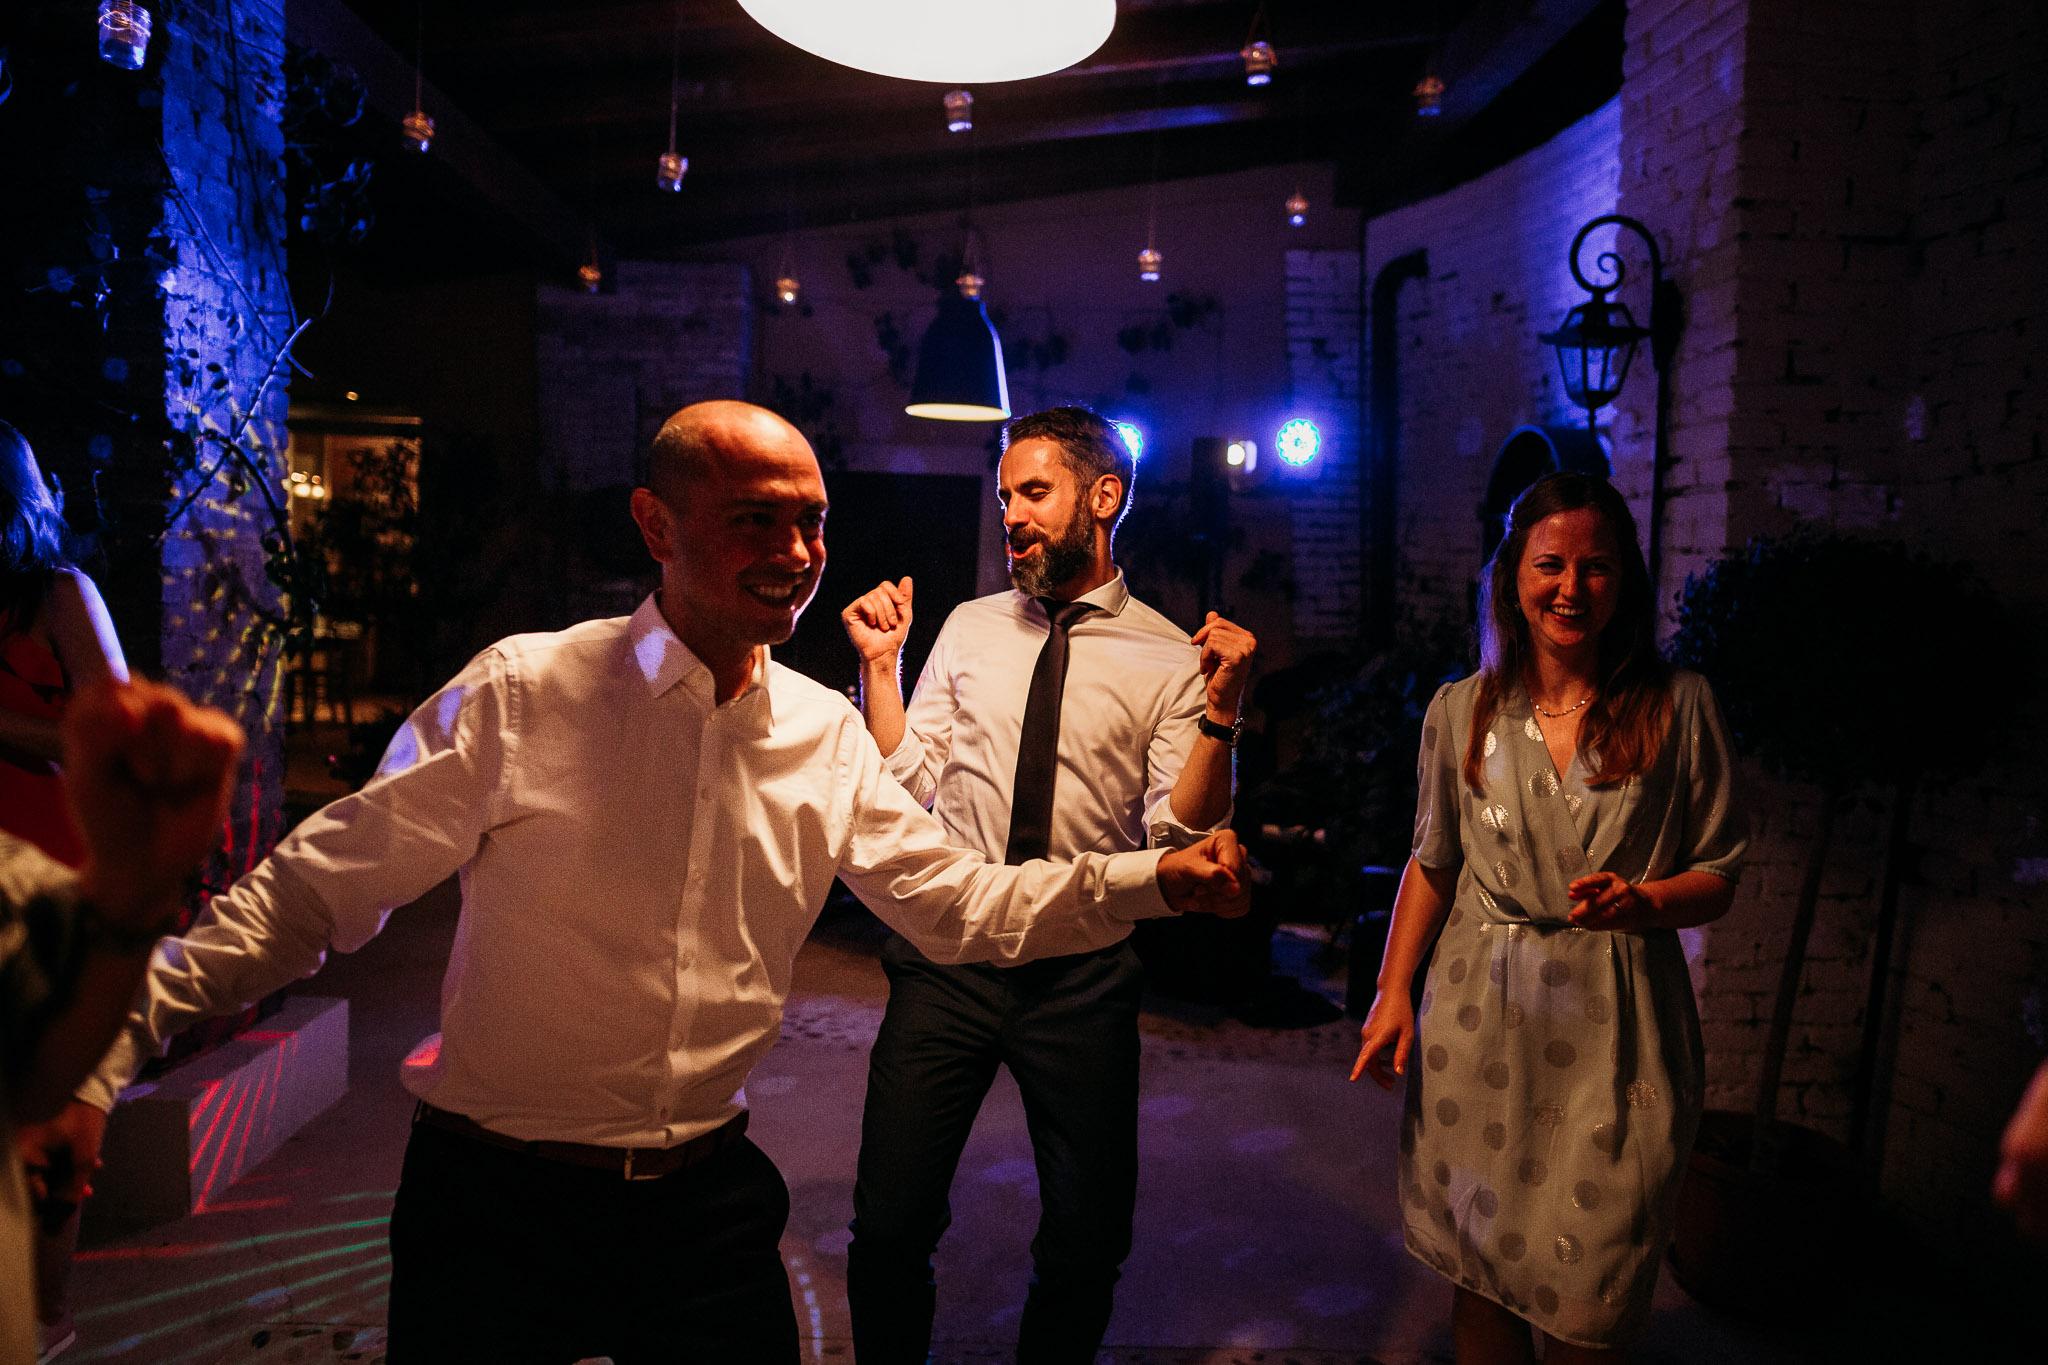 Dancing and partying at La Villa Hotel, Mombaruzzo